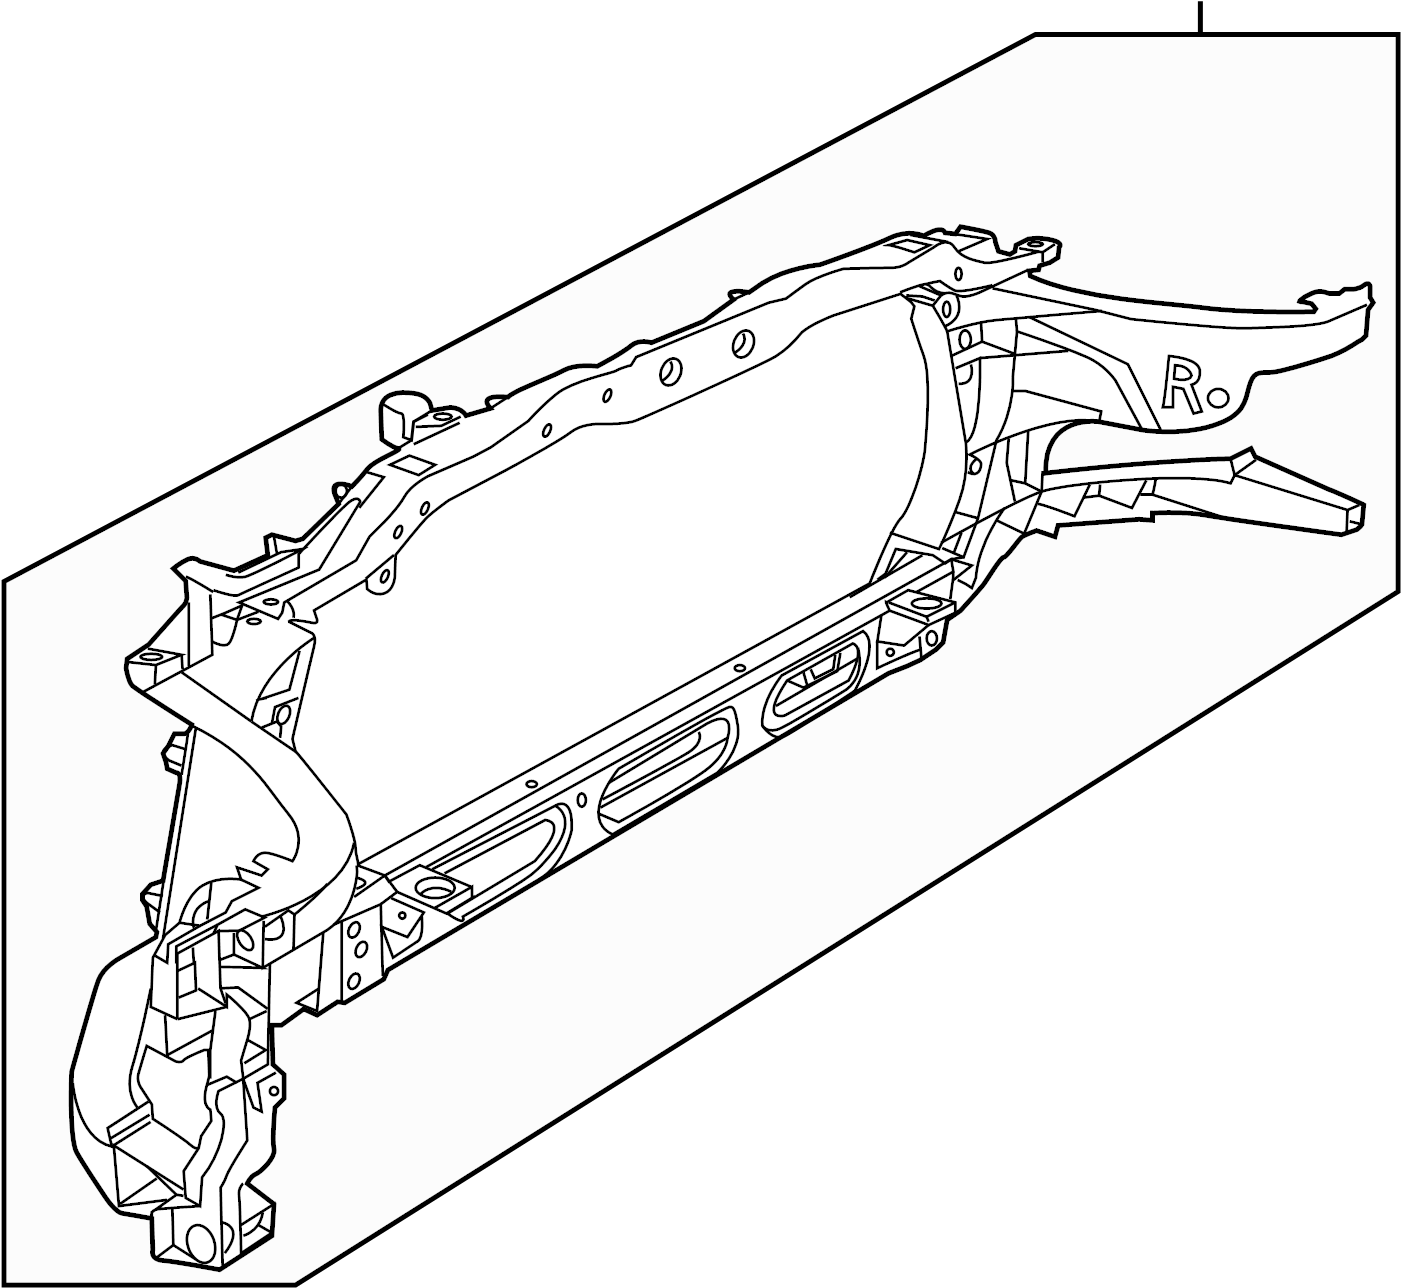 Ram Panel Radiator Closure Radiator Support